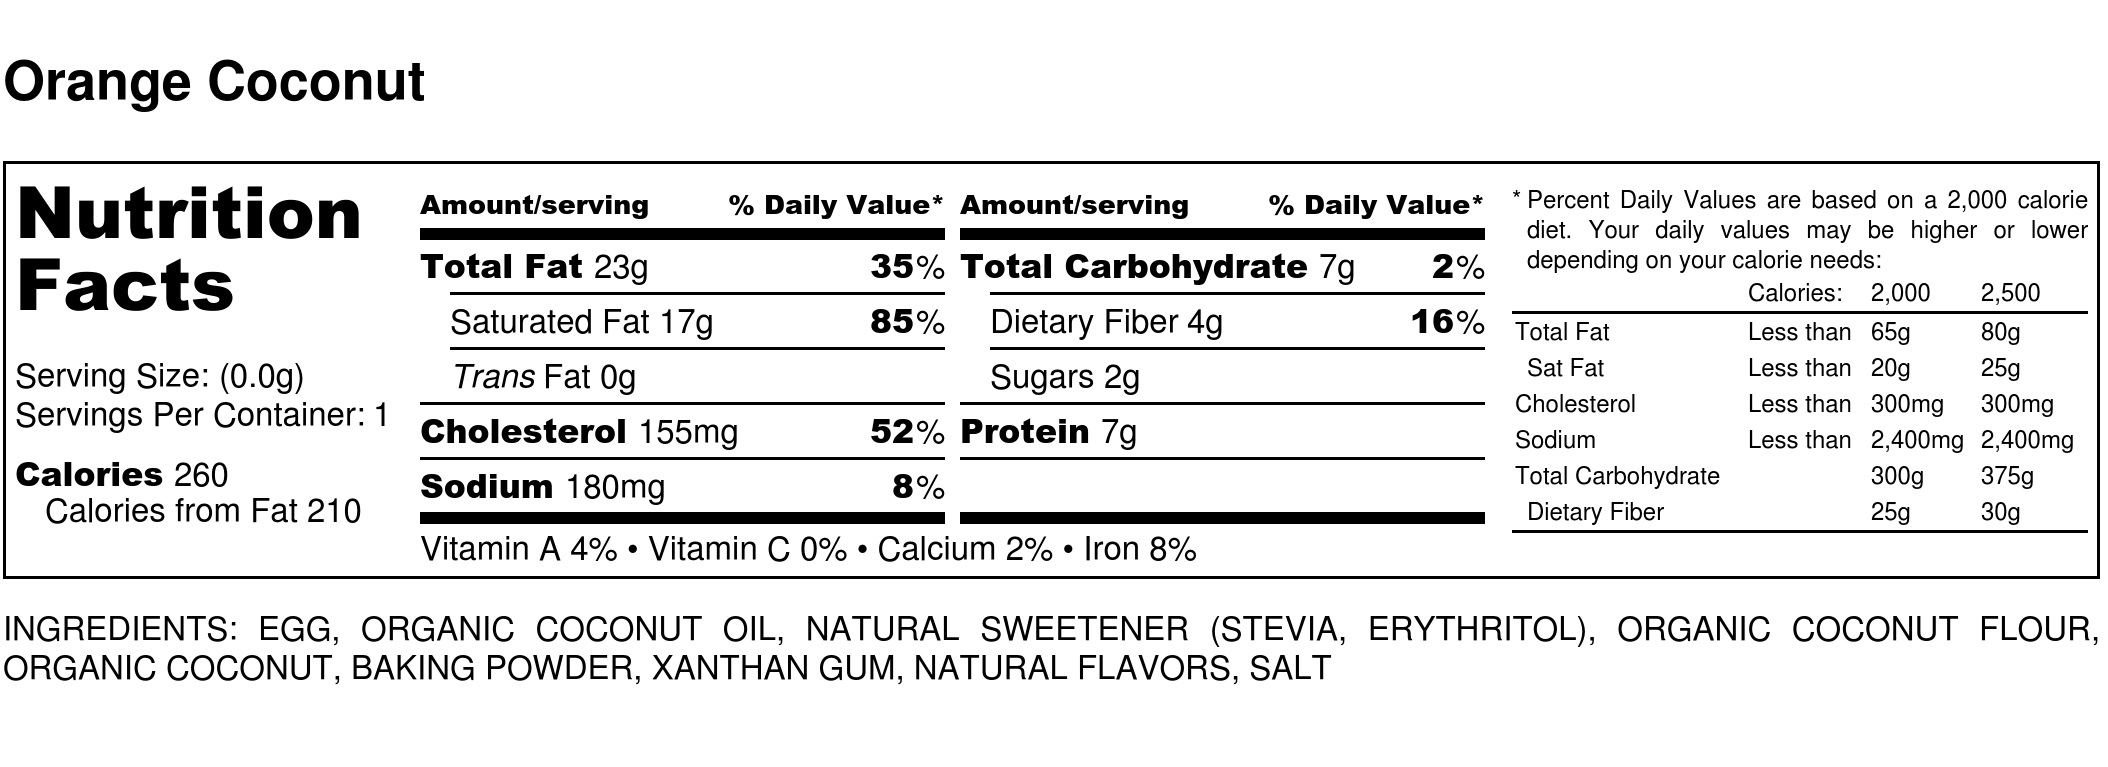 orange-coconut-nutrition-label-final.jpg